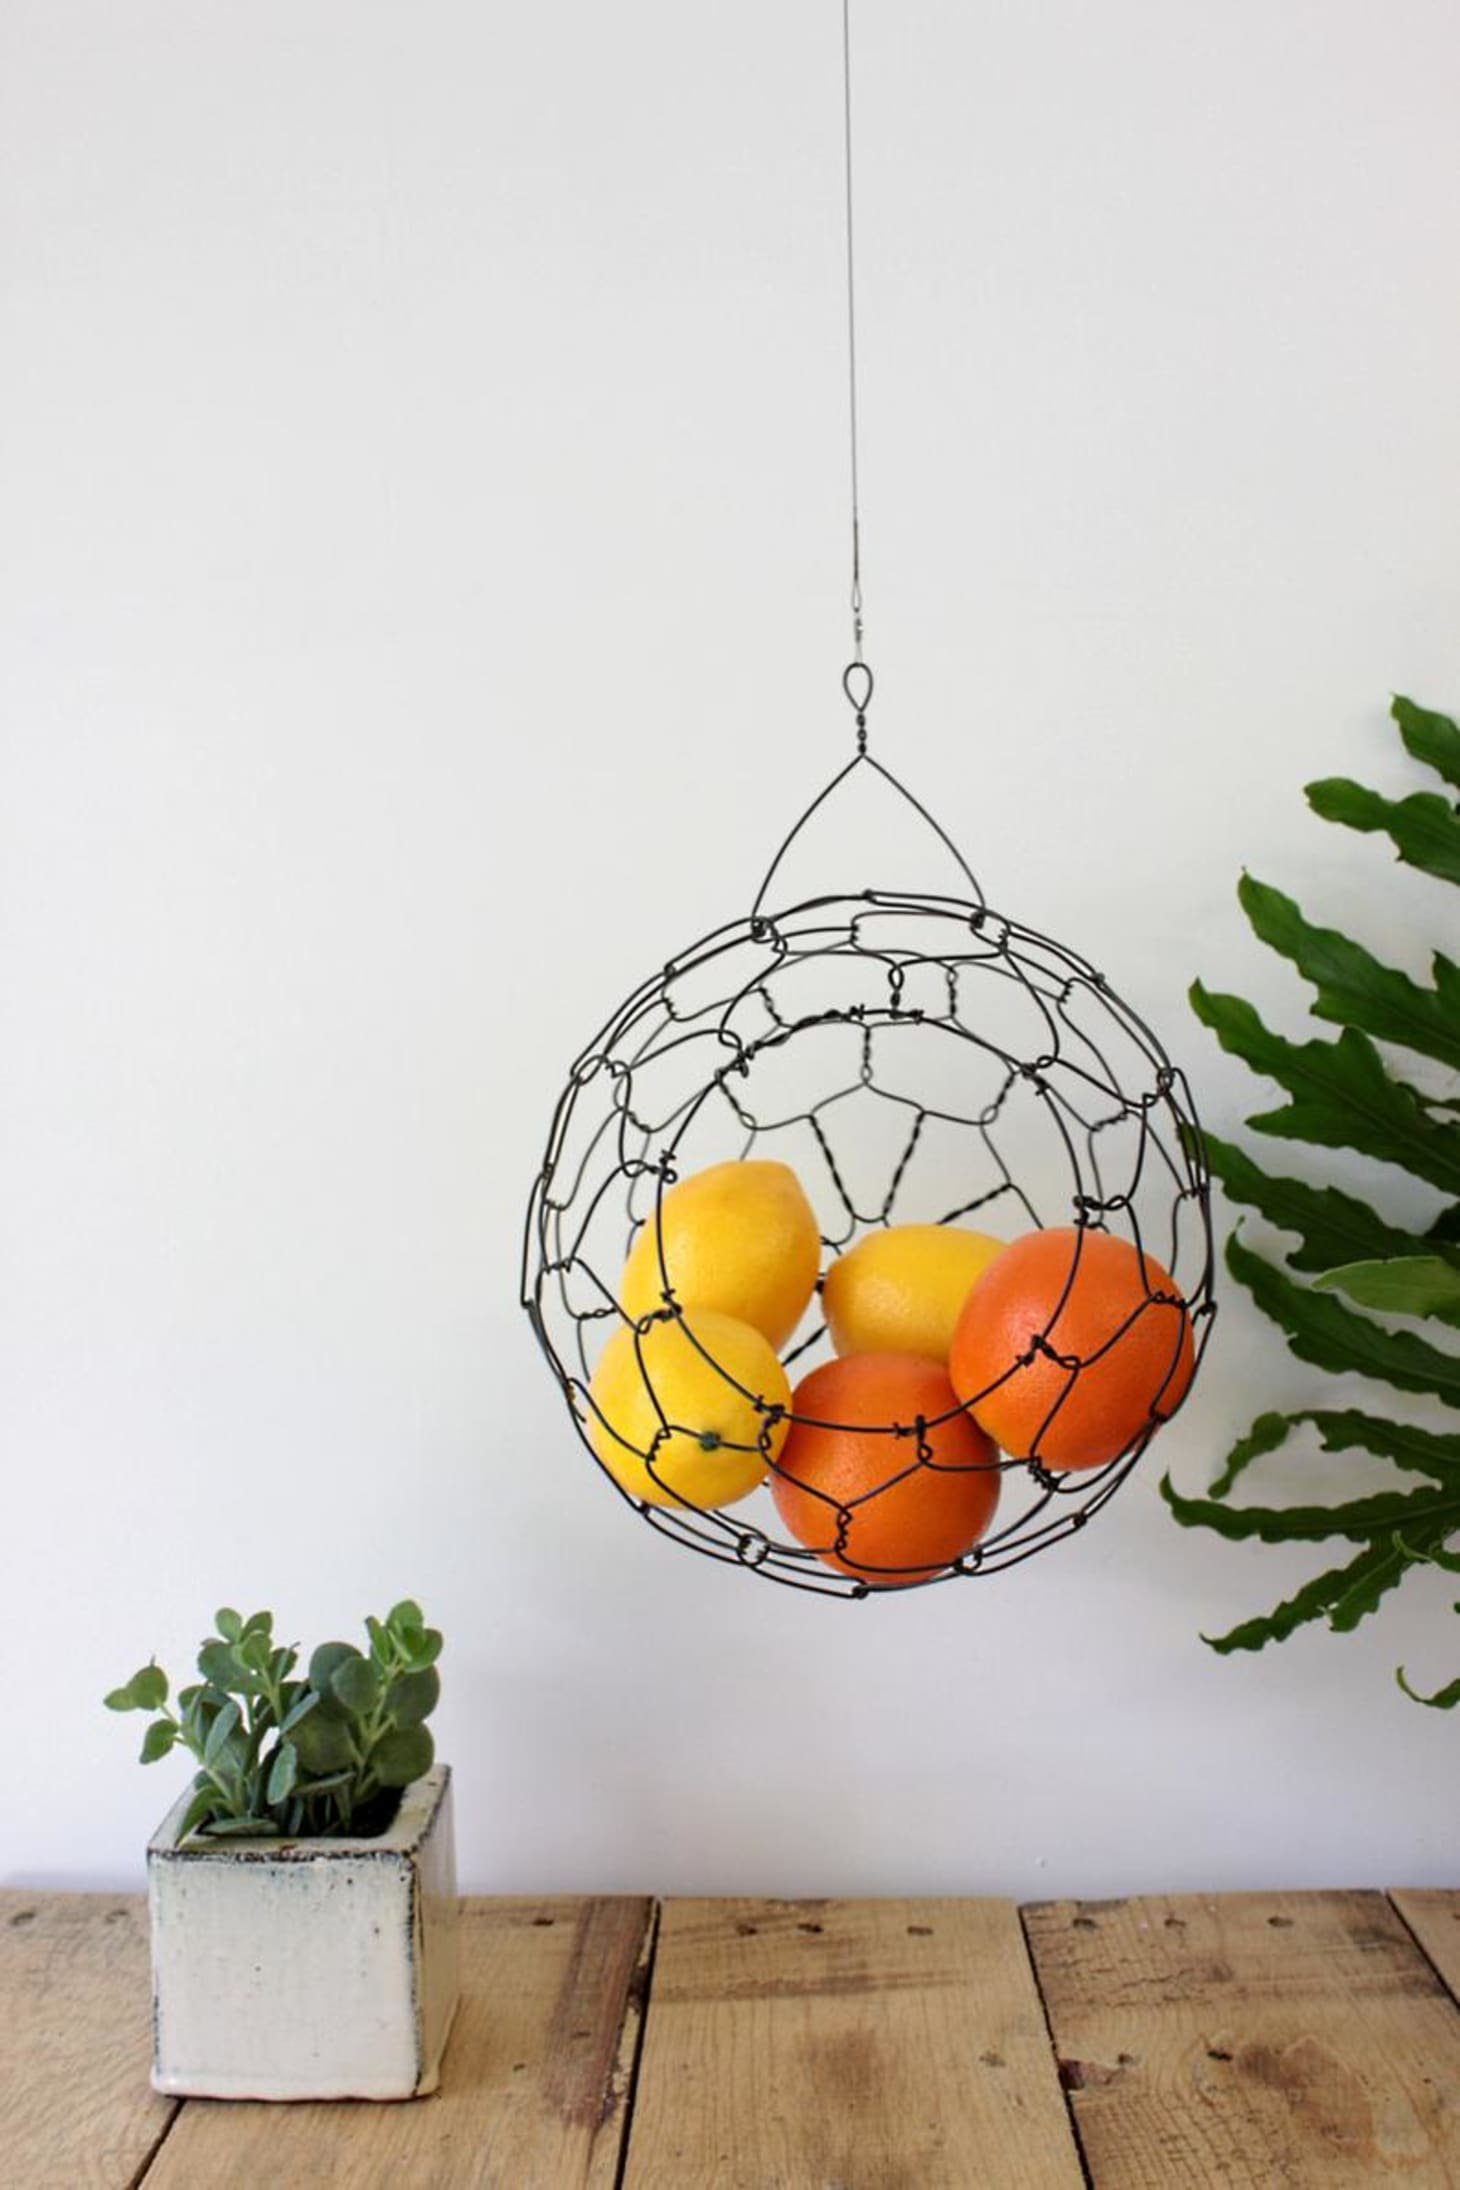 hanging fruit baskets - kitchen decor | kitchn